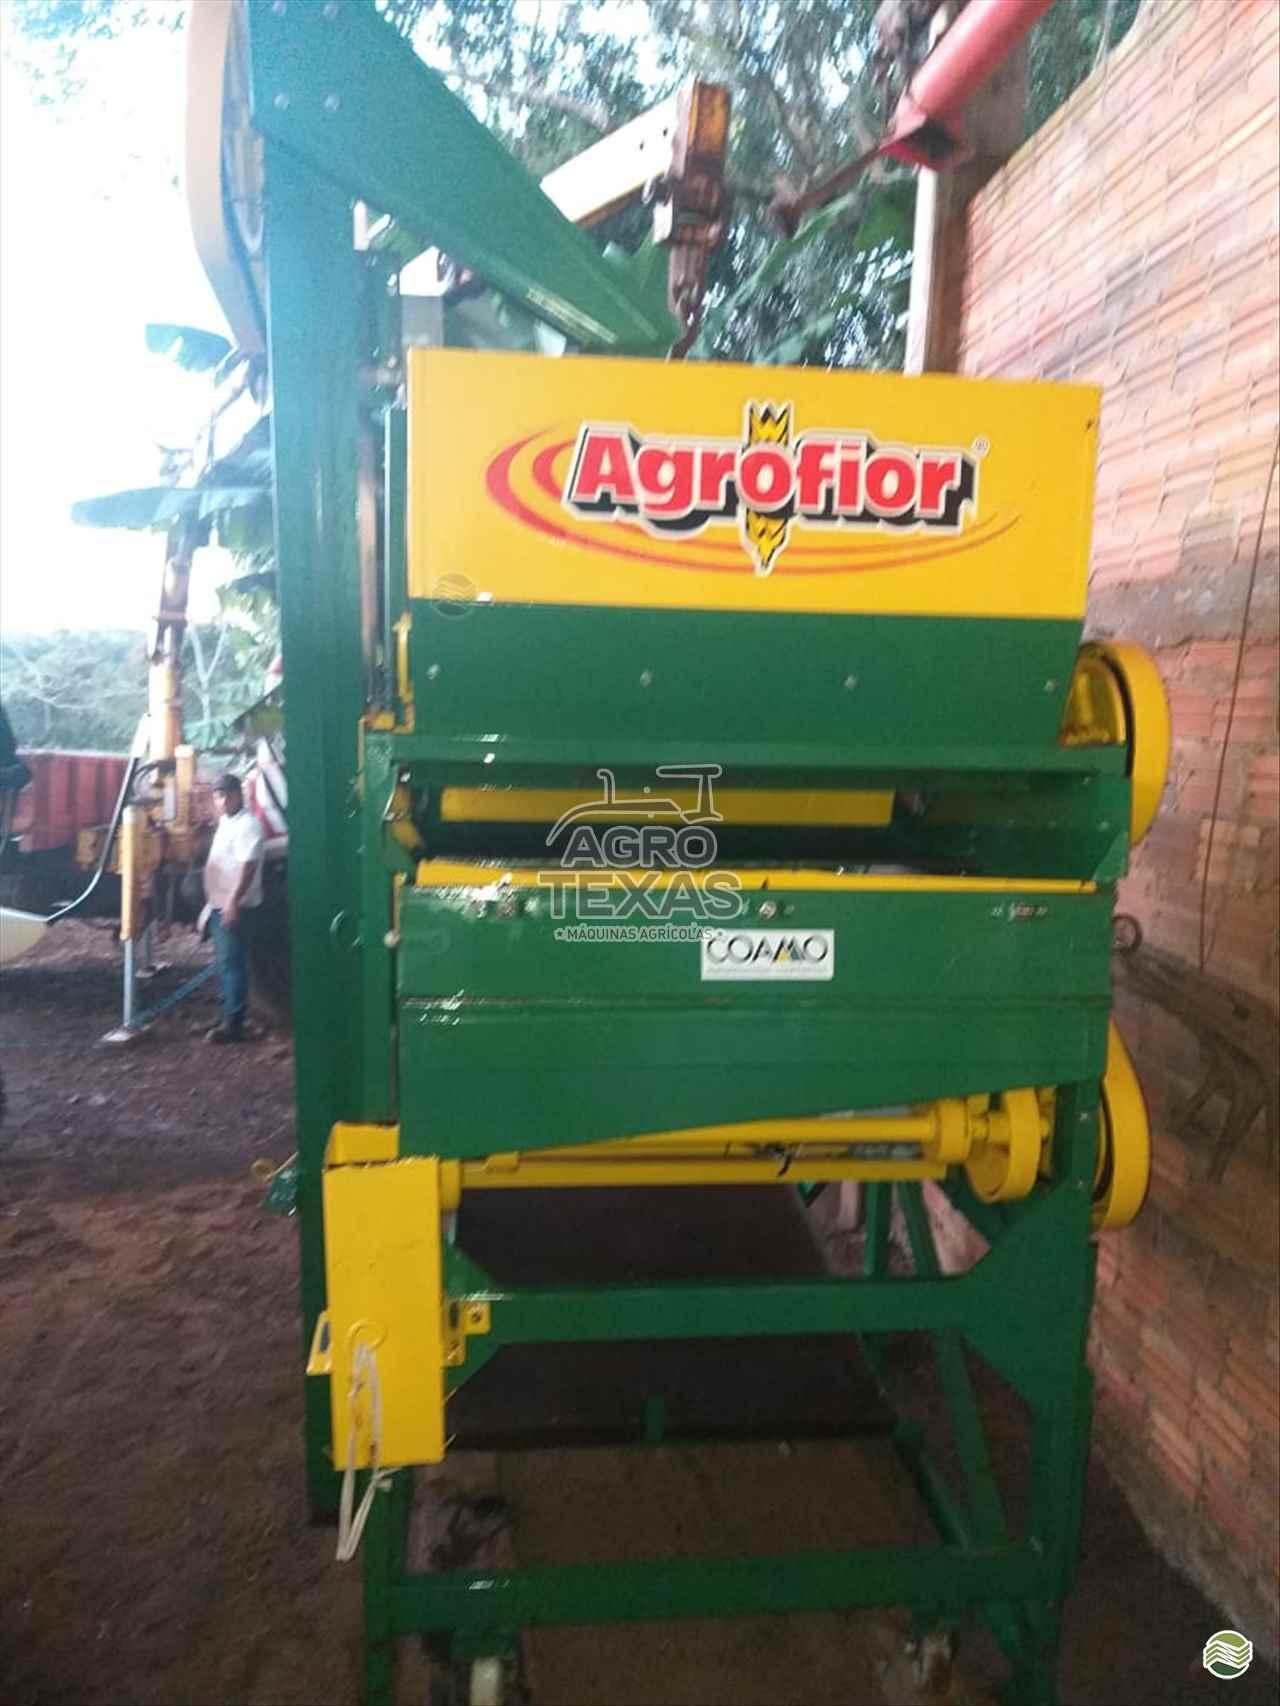 IMPLEMENTOS AGRICOLAS BENEFICIADORA DE GRÃOS CLASSIFICADOR DE SEMENTES Agro Texas Máquinas Agrícolas VITORINO PARANÁ PR